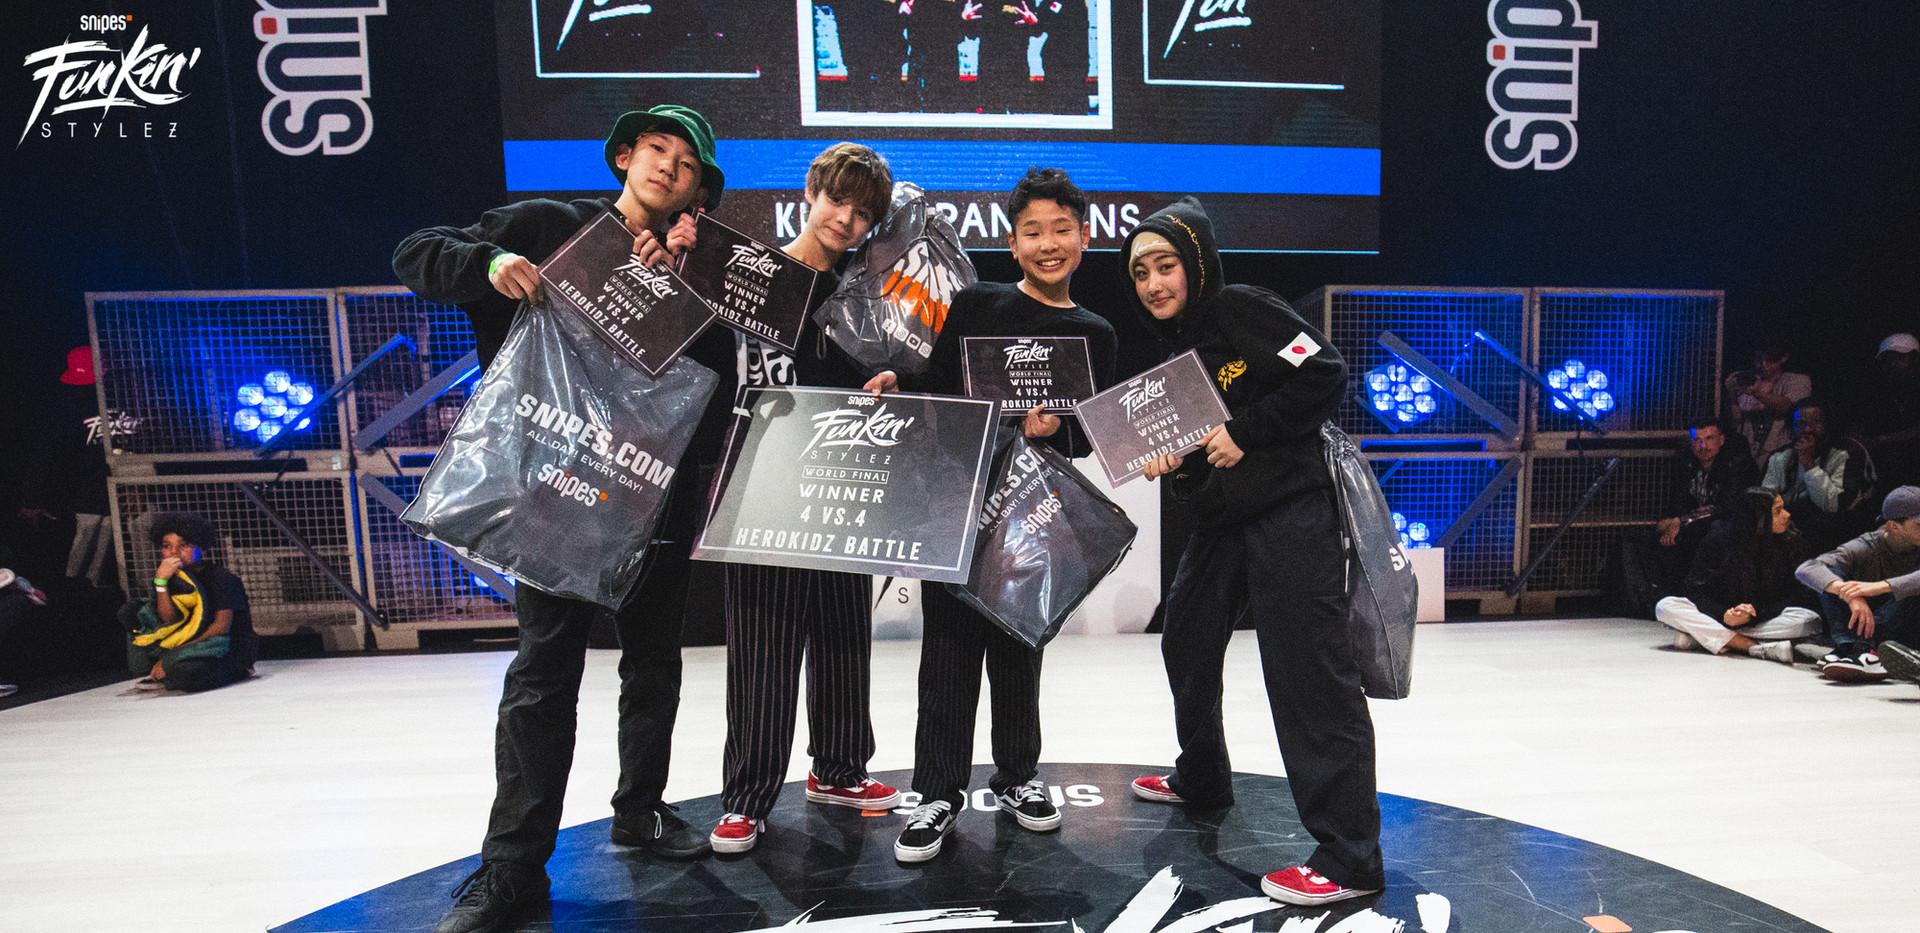 Team Japan Winner Kidz Team Battle